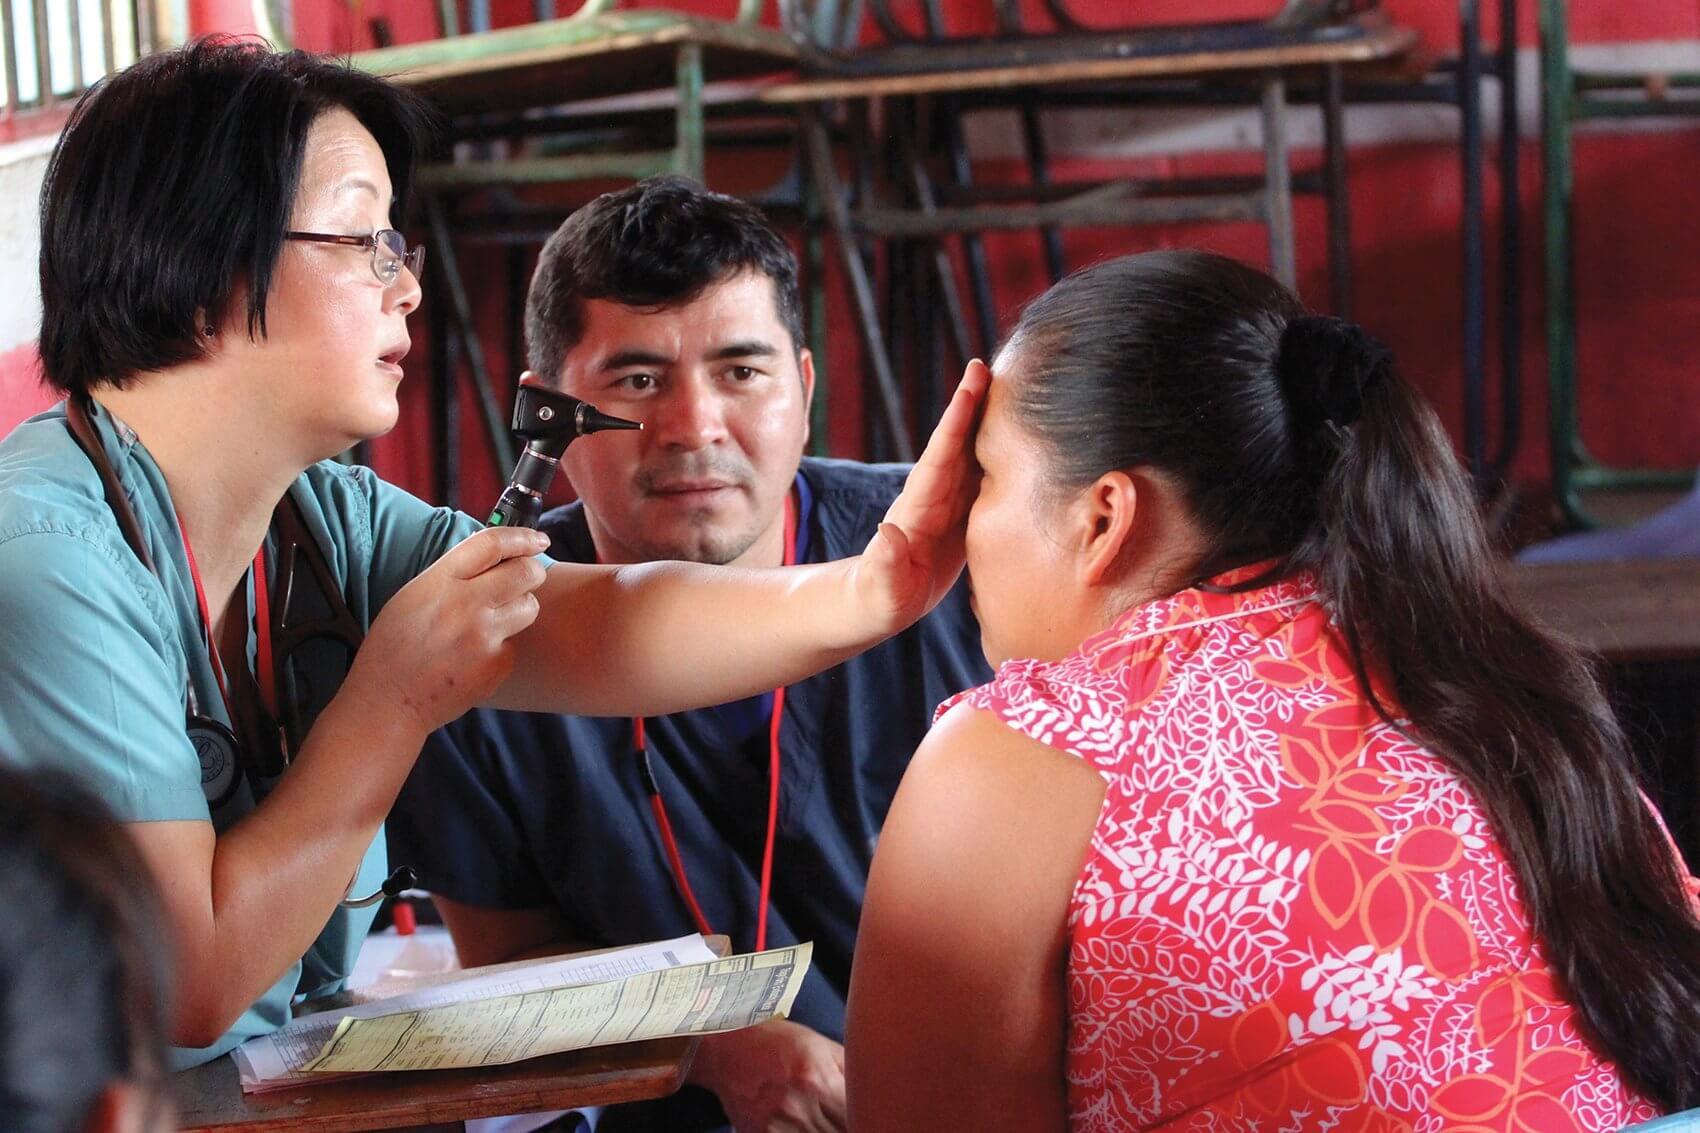 Yun Wang, M.D., examines a patient's eyes. (Credit: Josie Johnson)